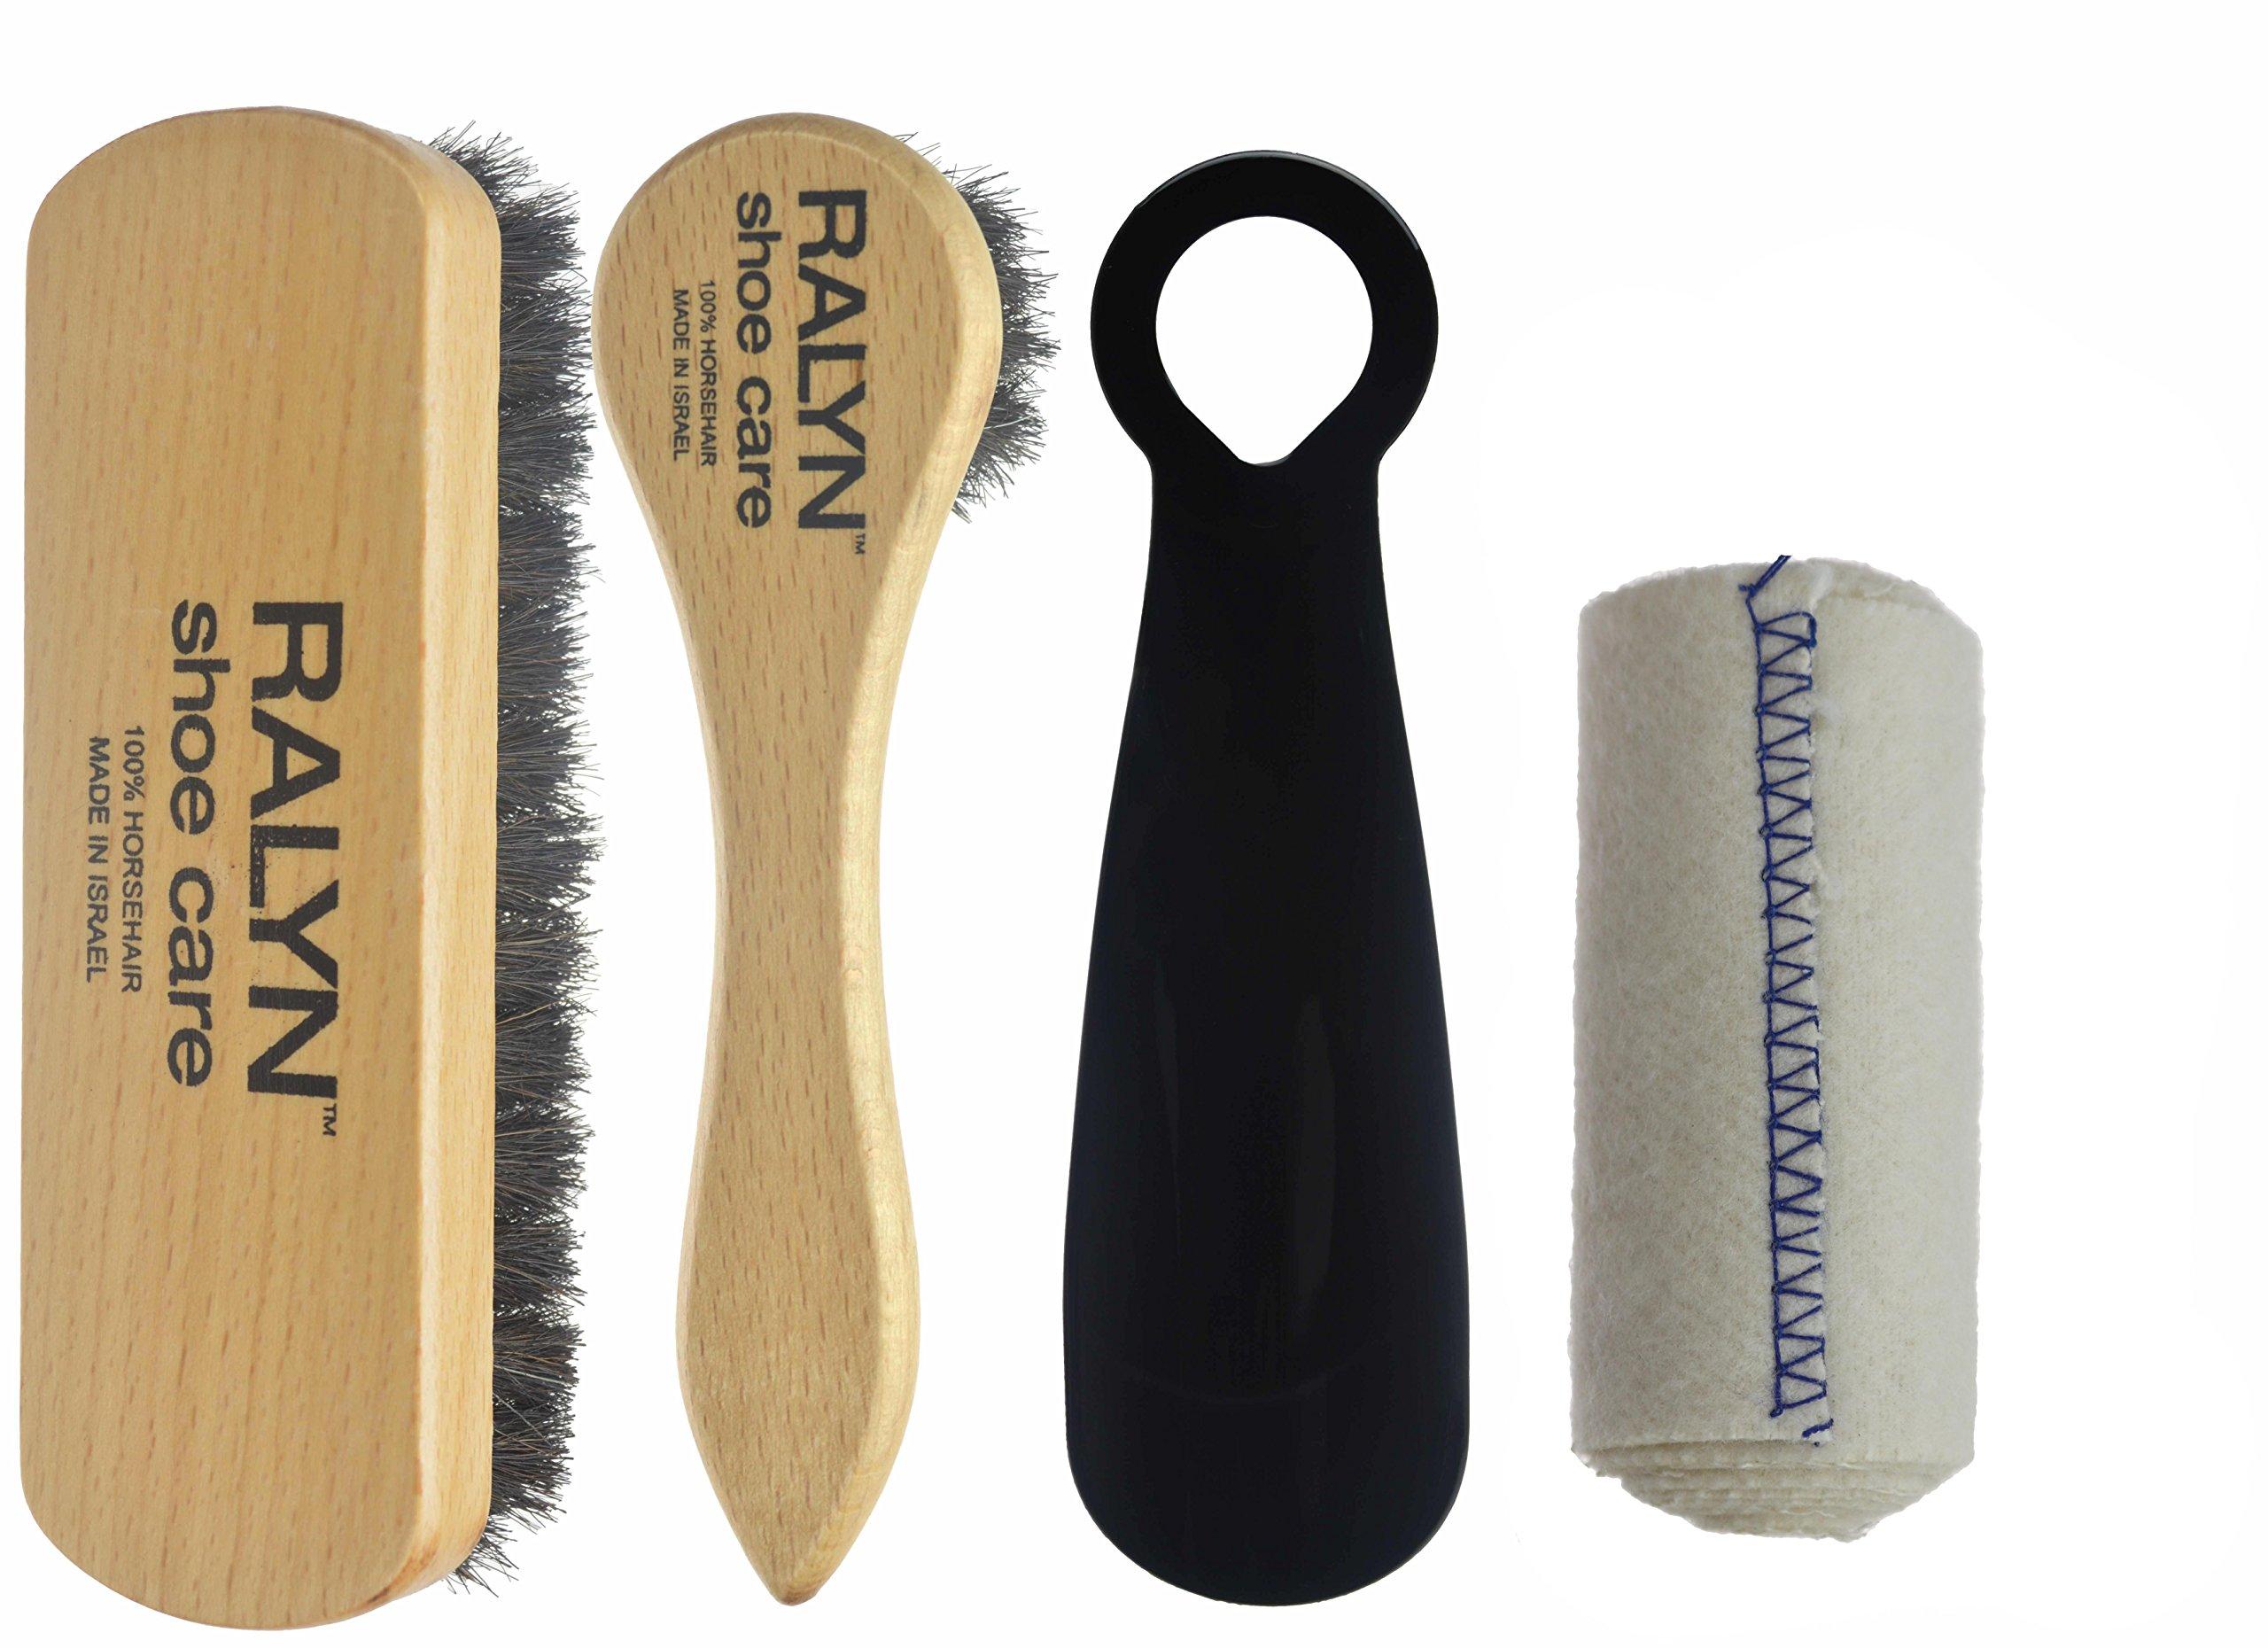 Travel Shoe Shine Kit. Dark Bristle 100% Horsehair Brush & Dauber. Shoe shine cloth. 5.5 IN. Shoe Horn. (BLACK)